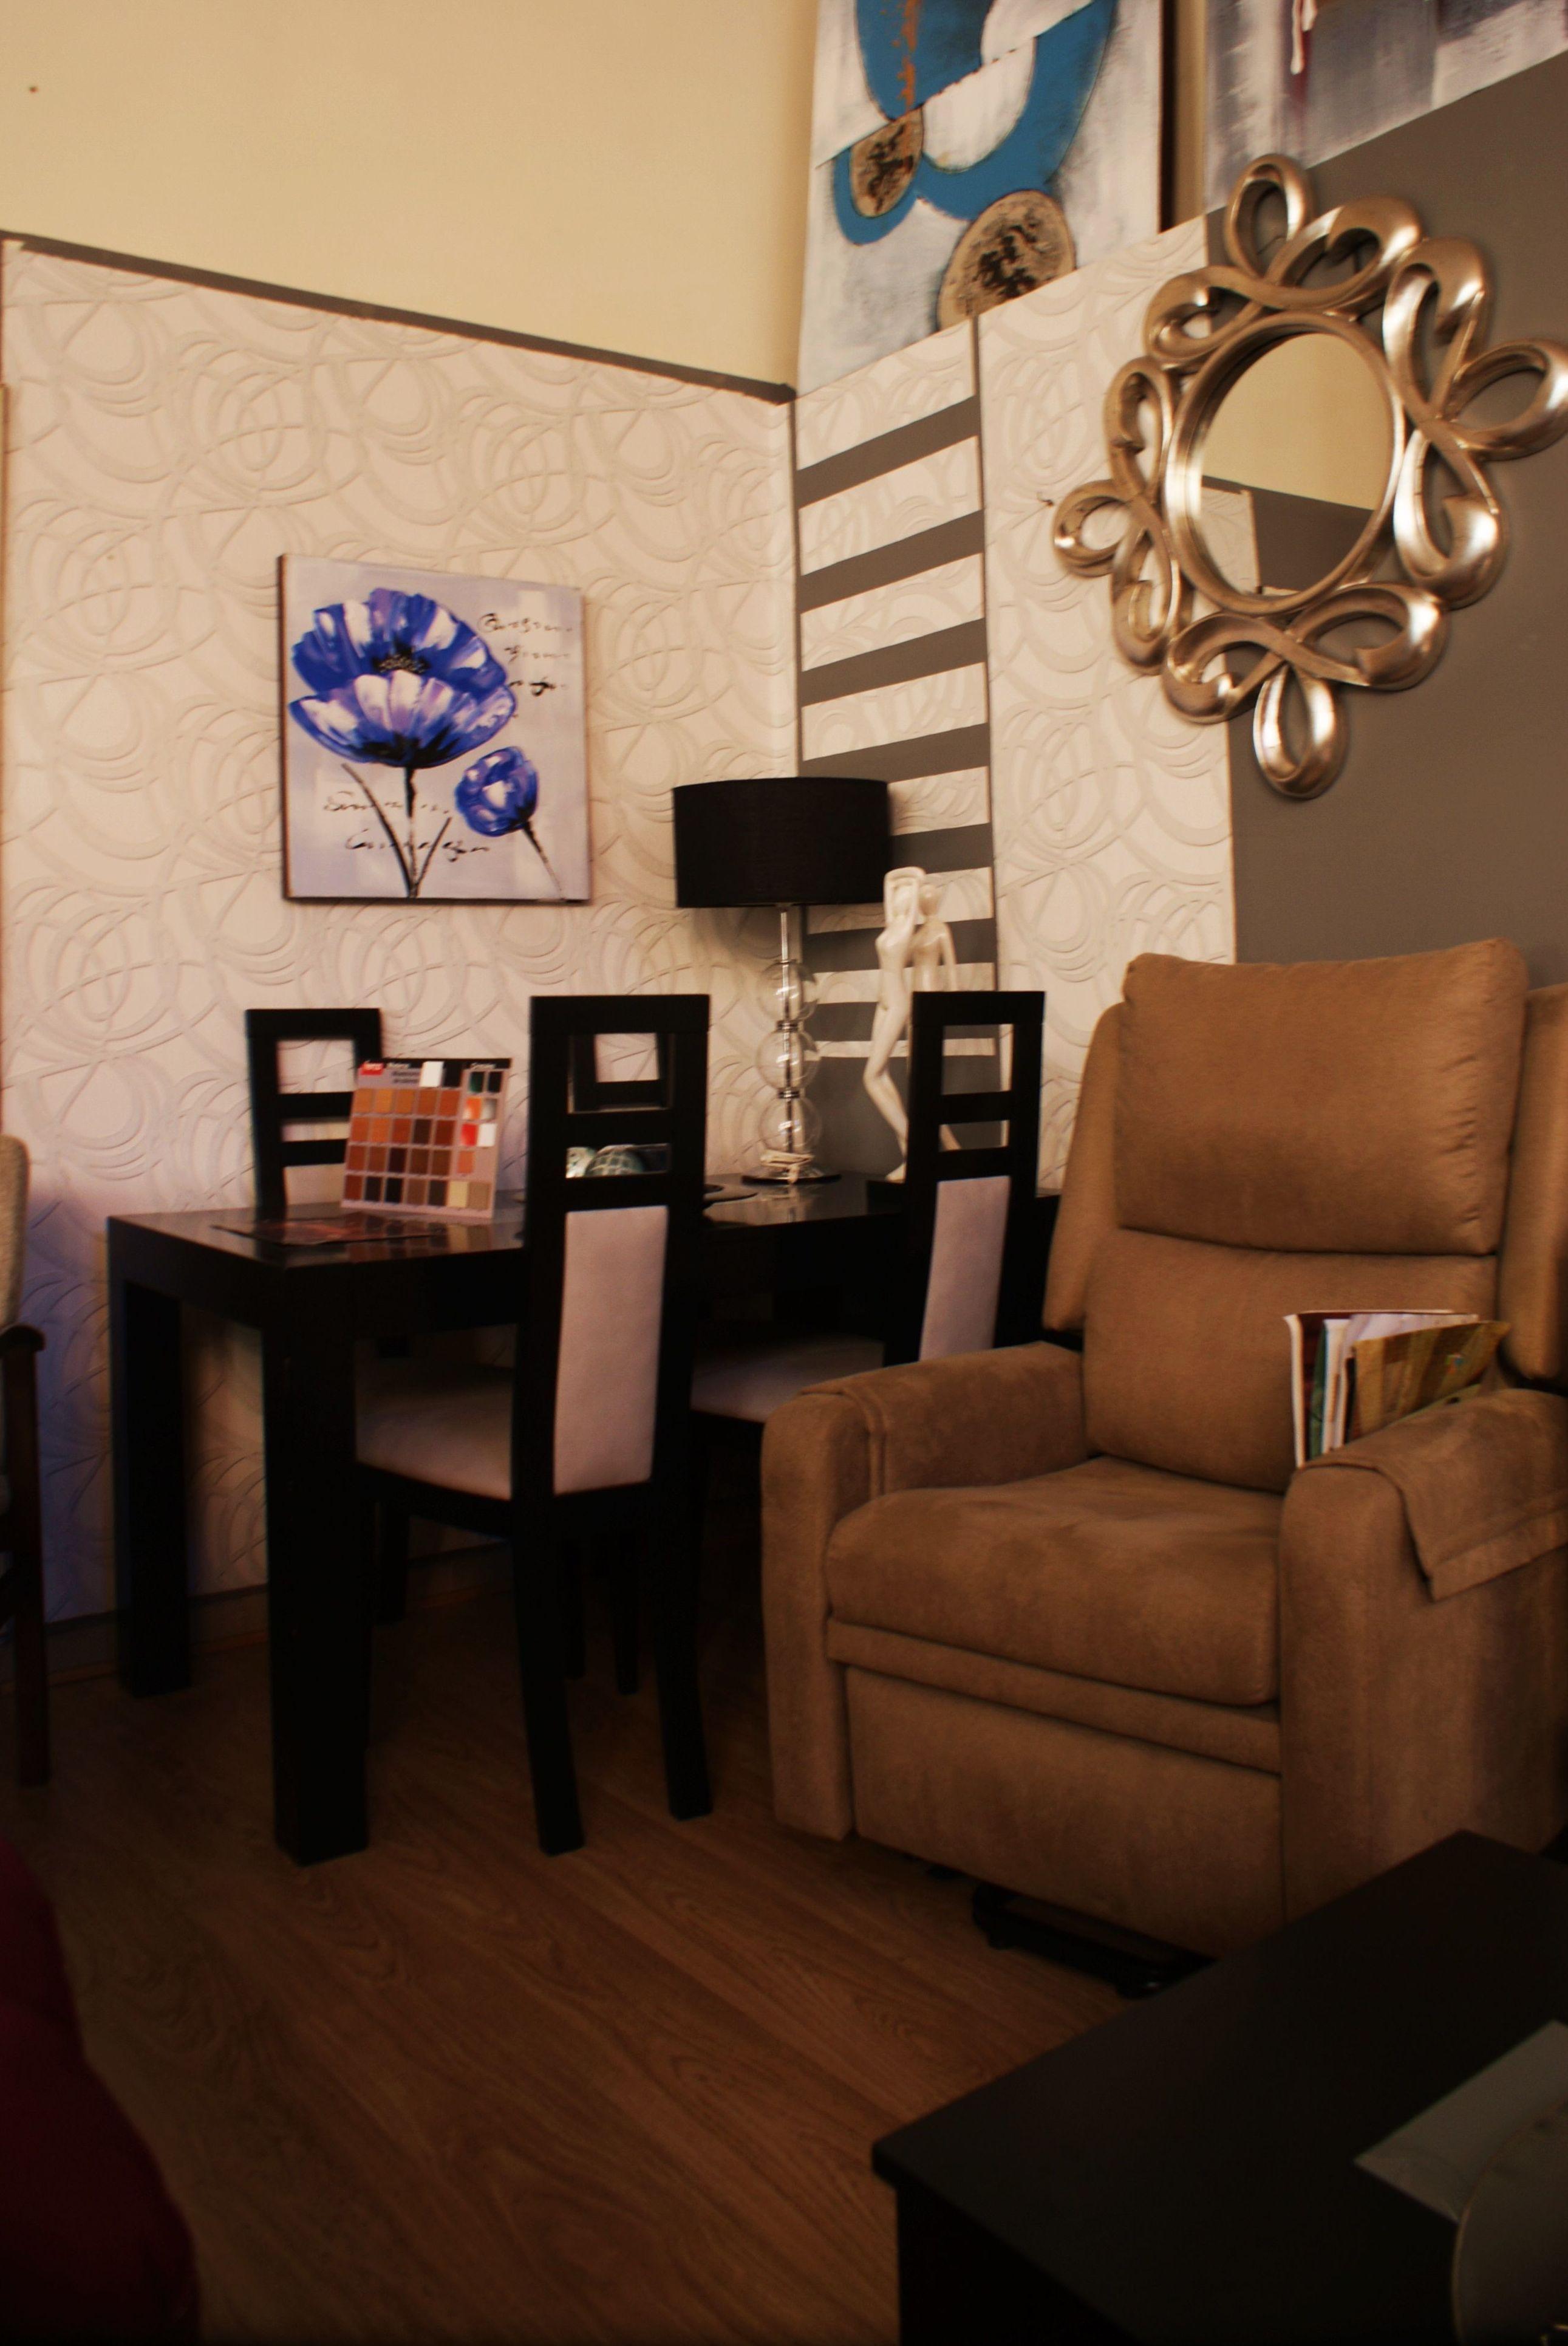 muebles dormitorio baratos madrid muebles oligom